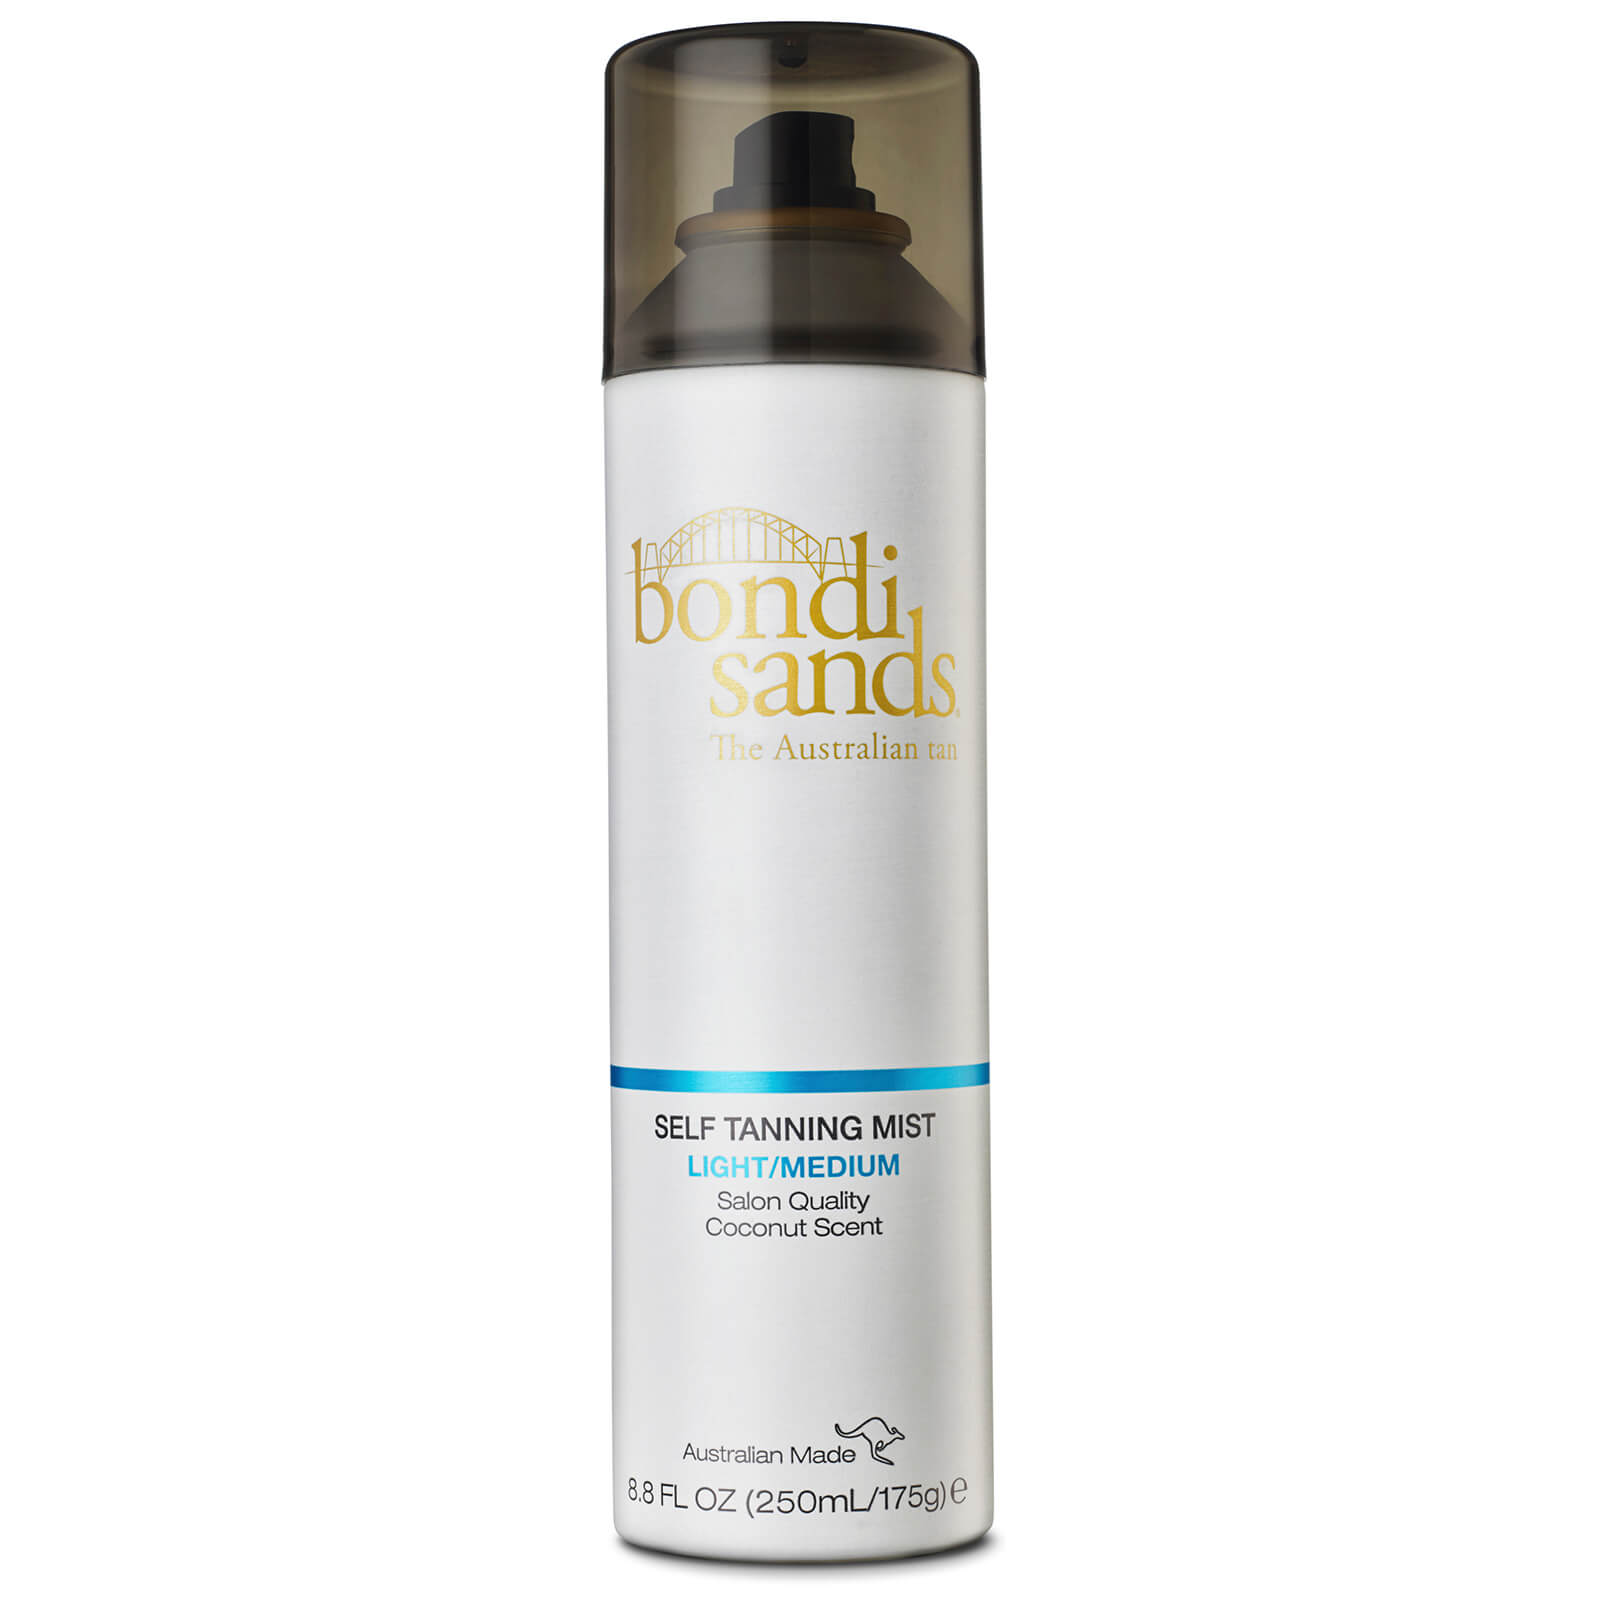 e9b1619f7a1 Bondi Sands Self Tanning Mist 250ml - Light Medium   BeautyExpert